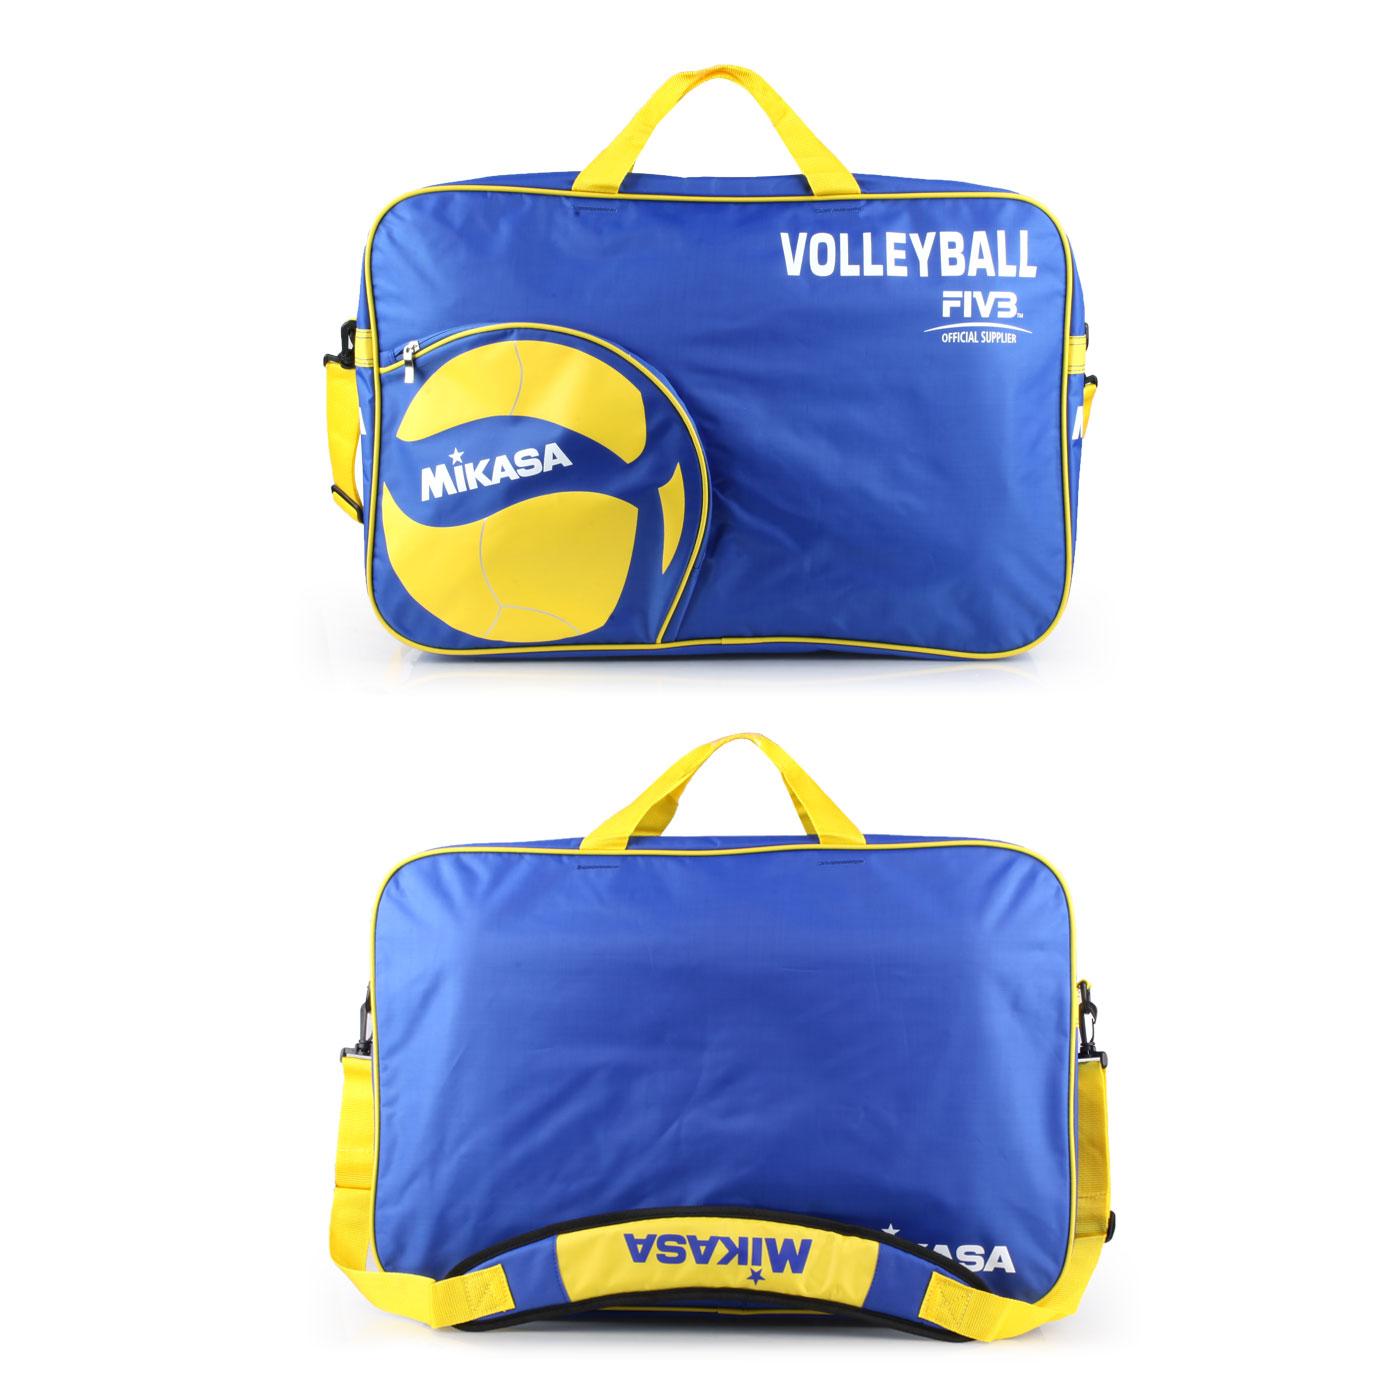 MIKASA 排球袋(6顆裝) MKAC-BG260W-BL - 藍黃